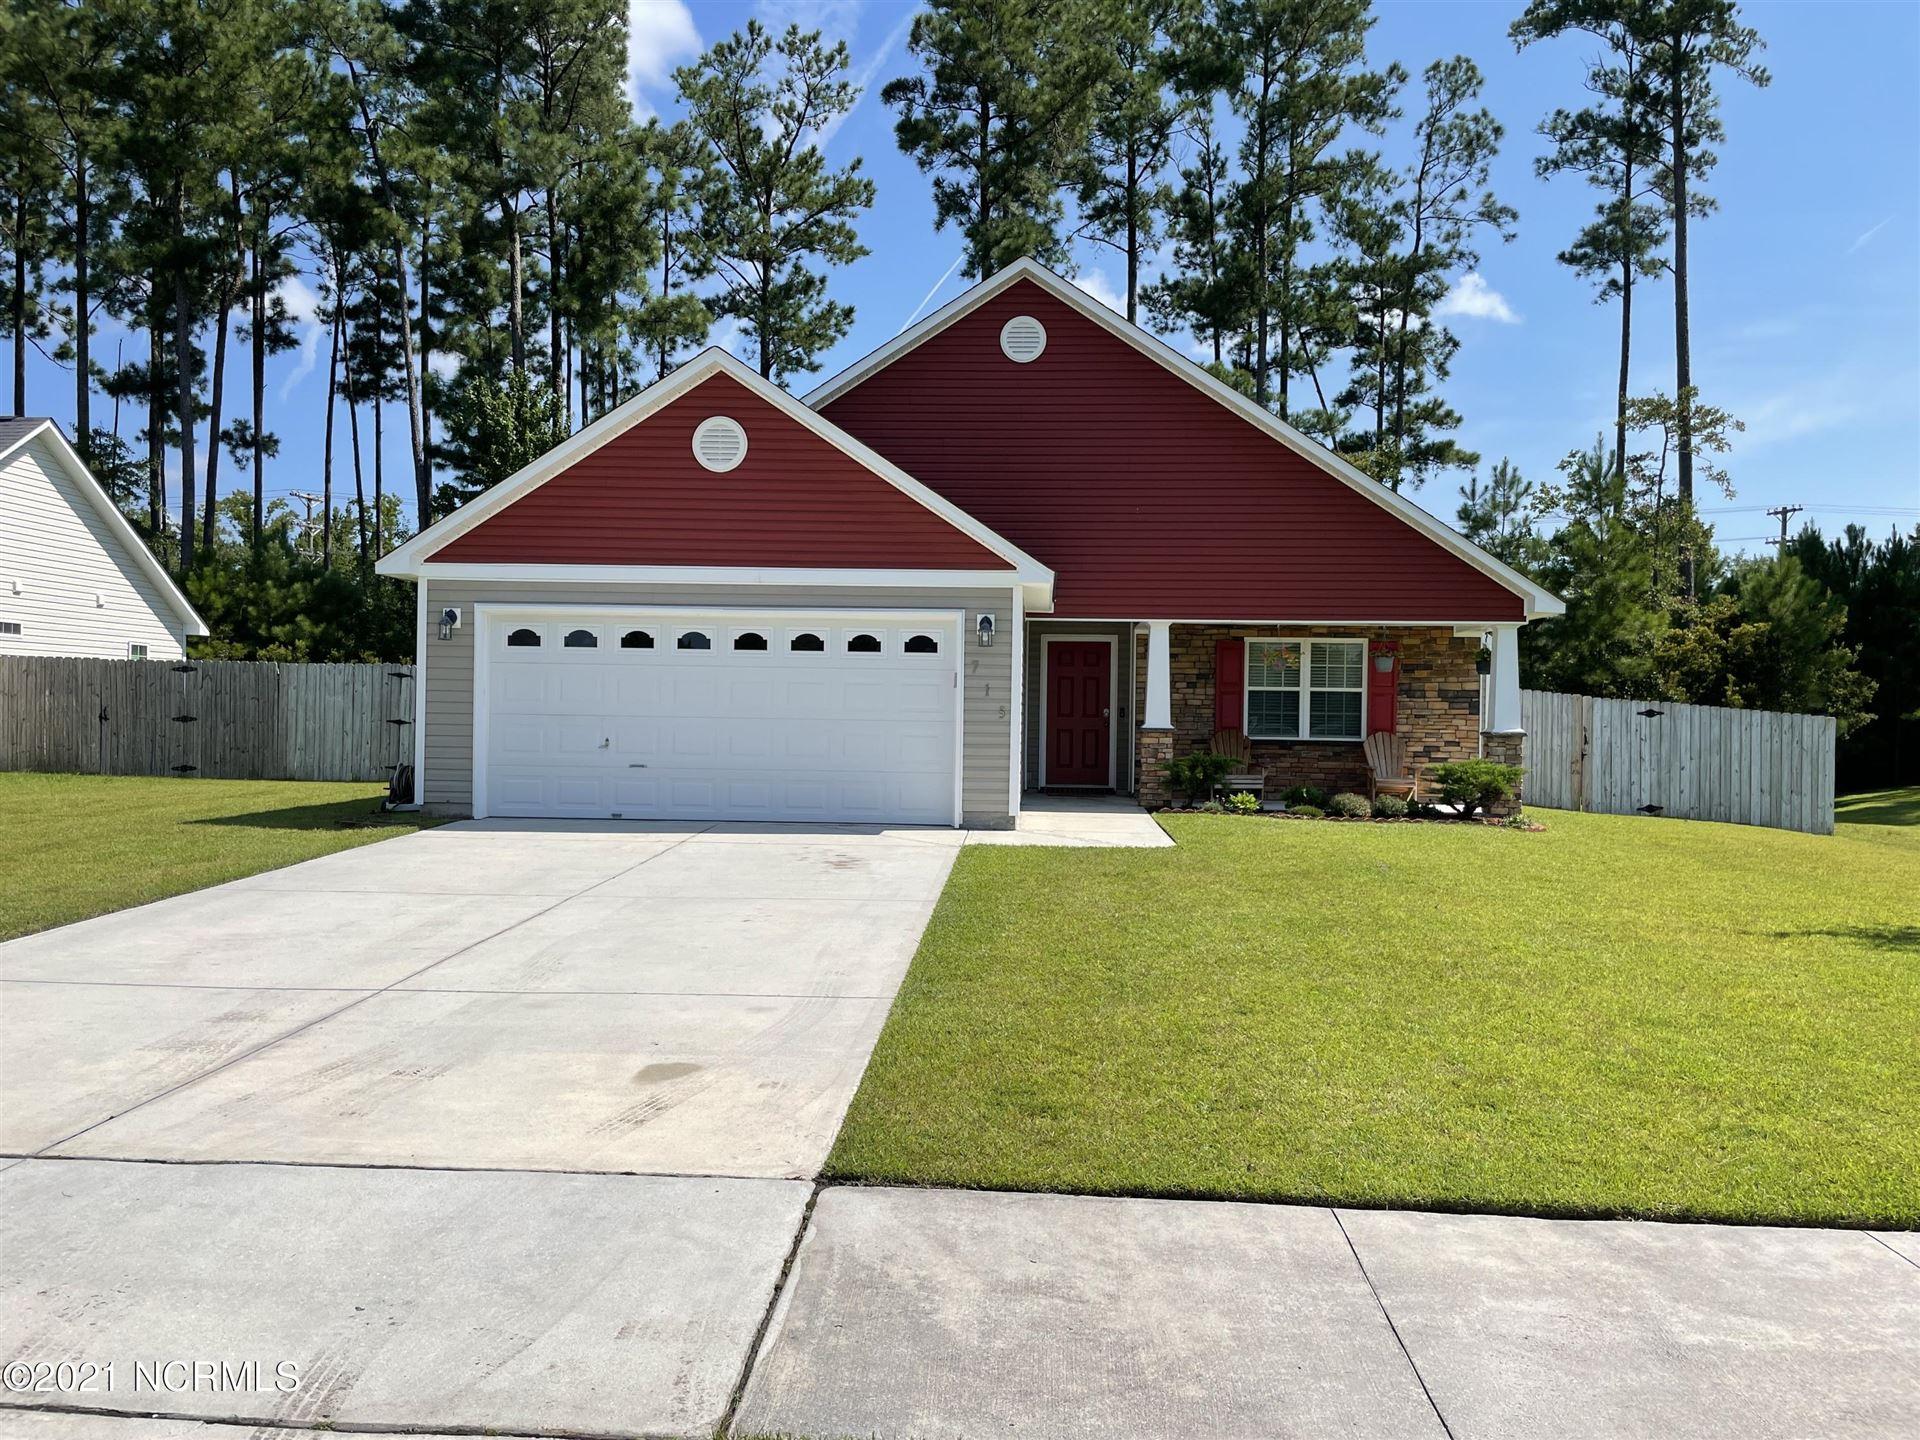 Photo of 715 Savannah Drive, Jacksonville, NC 28546 (MLS # 100285979)